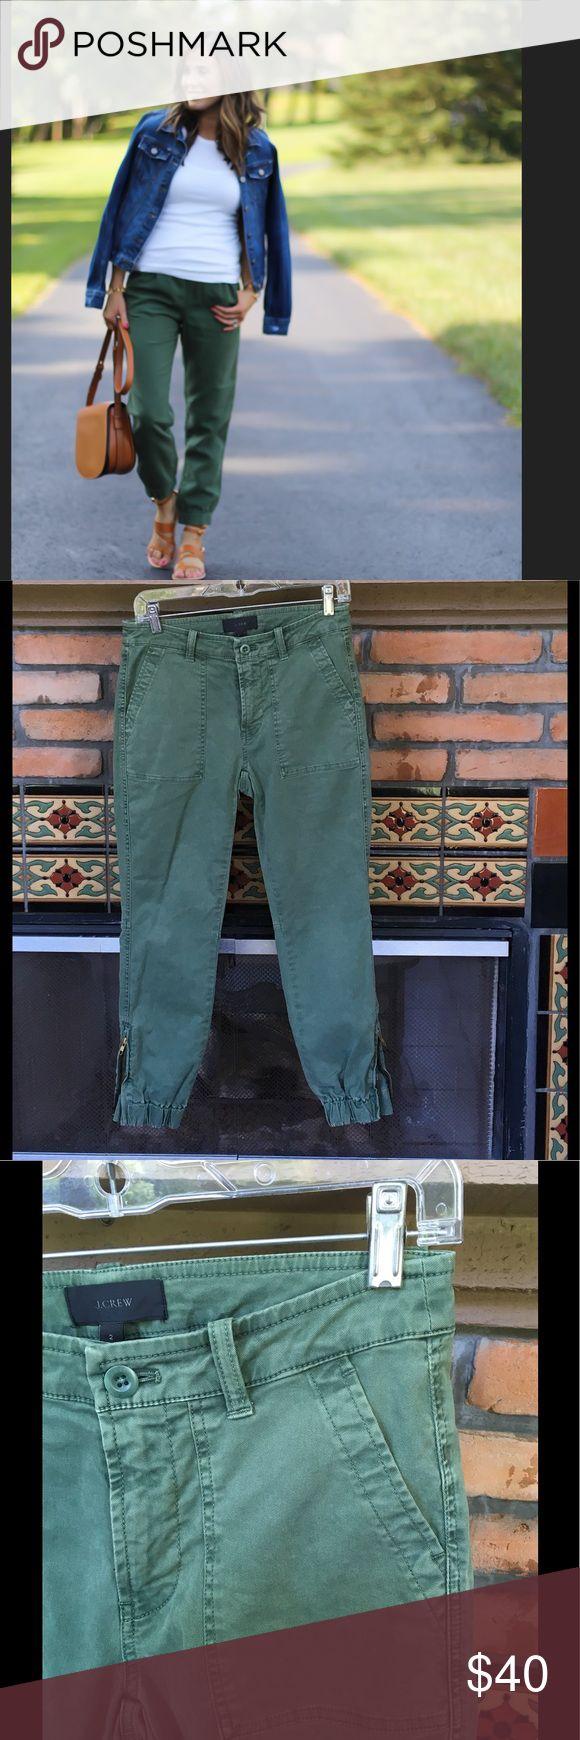 NWOT J CREW FATIGUE GREEN JOGGER CHINOS 2 FAB FATIGUE GREEN JOGGER CHINOS BY J CREW NWOT J. Crew Pants Track Pants & Joggers